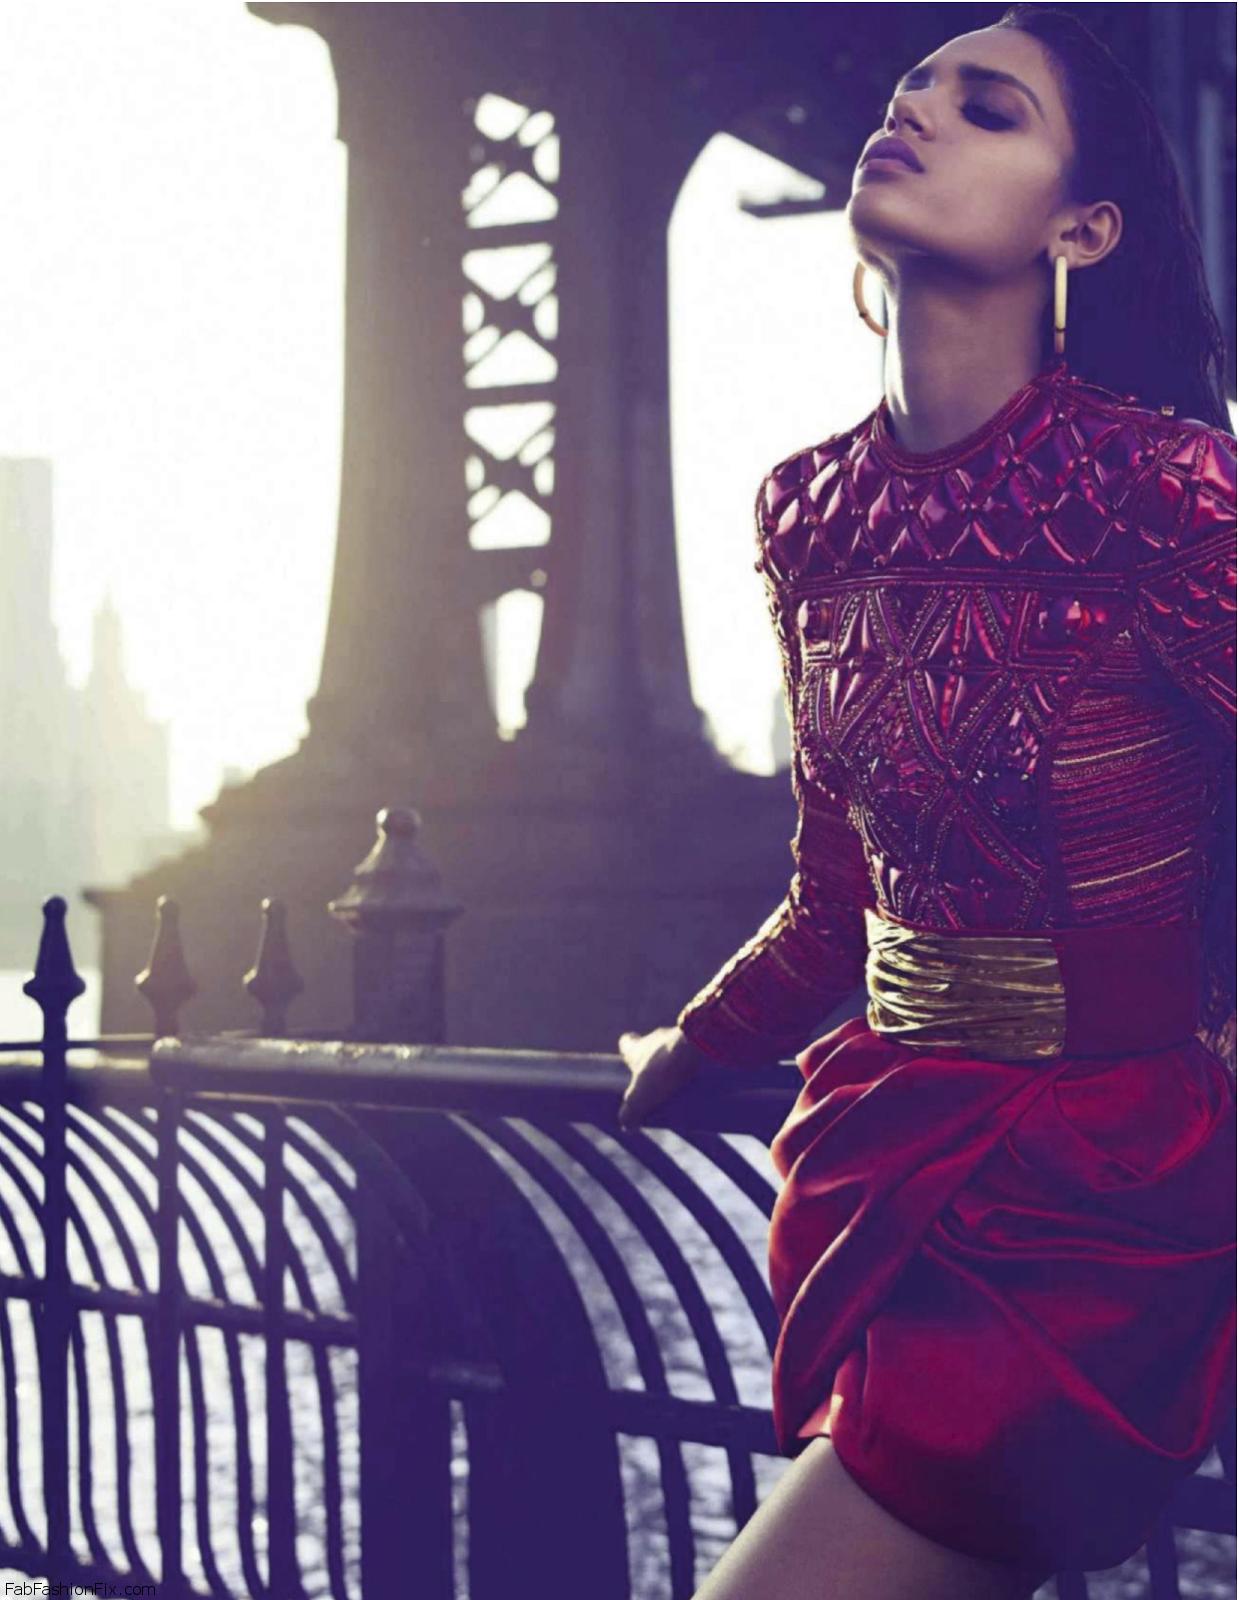 Vogue_Spain_-_Noviembre_2013 (dragged) 21